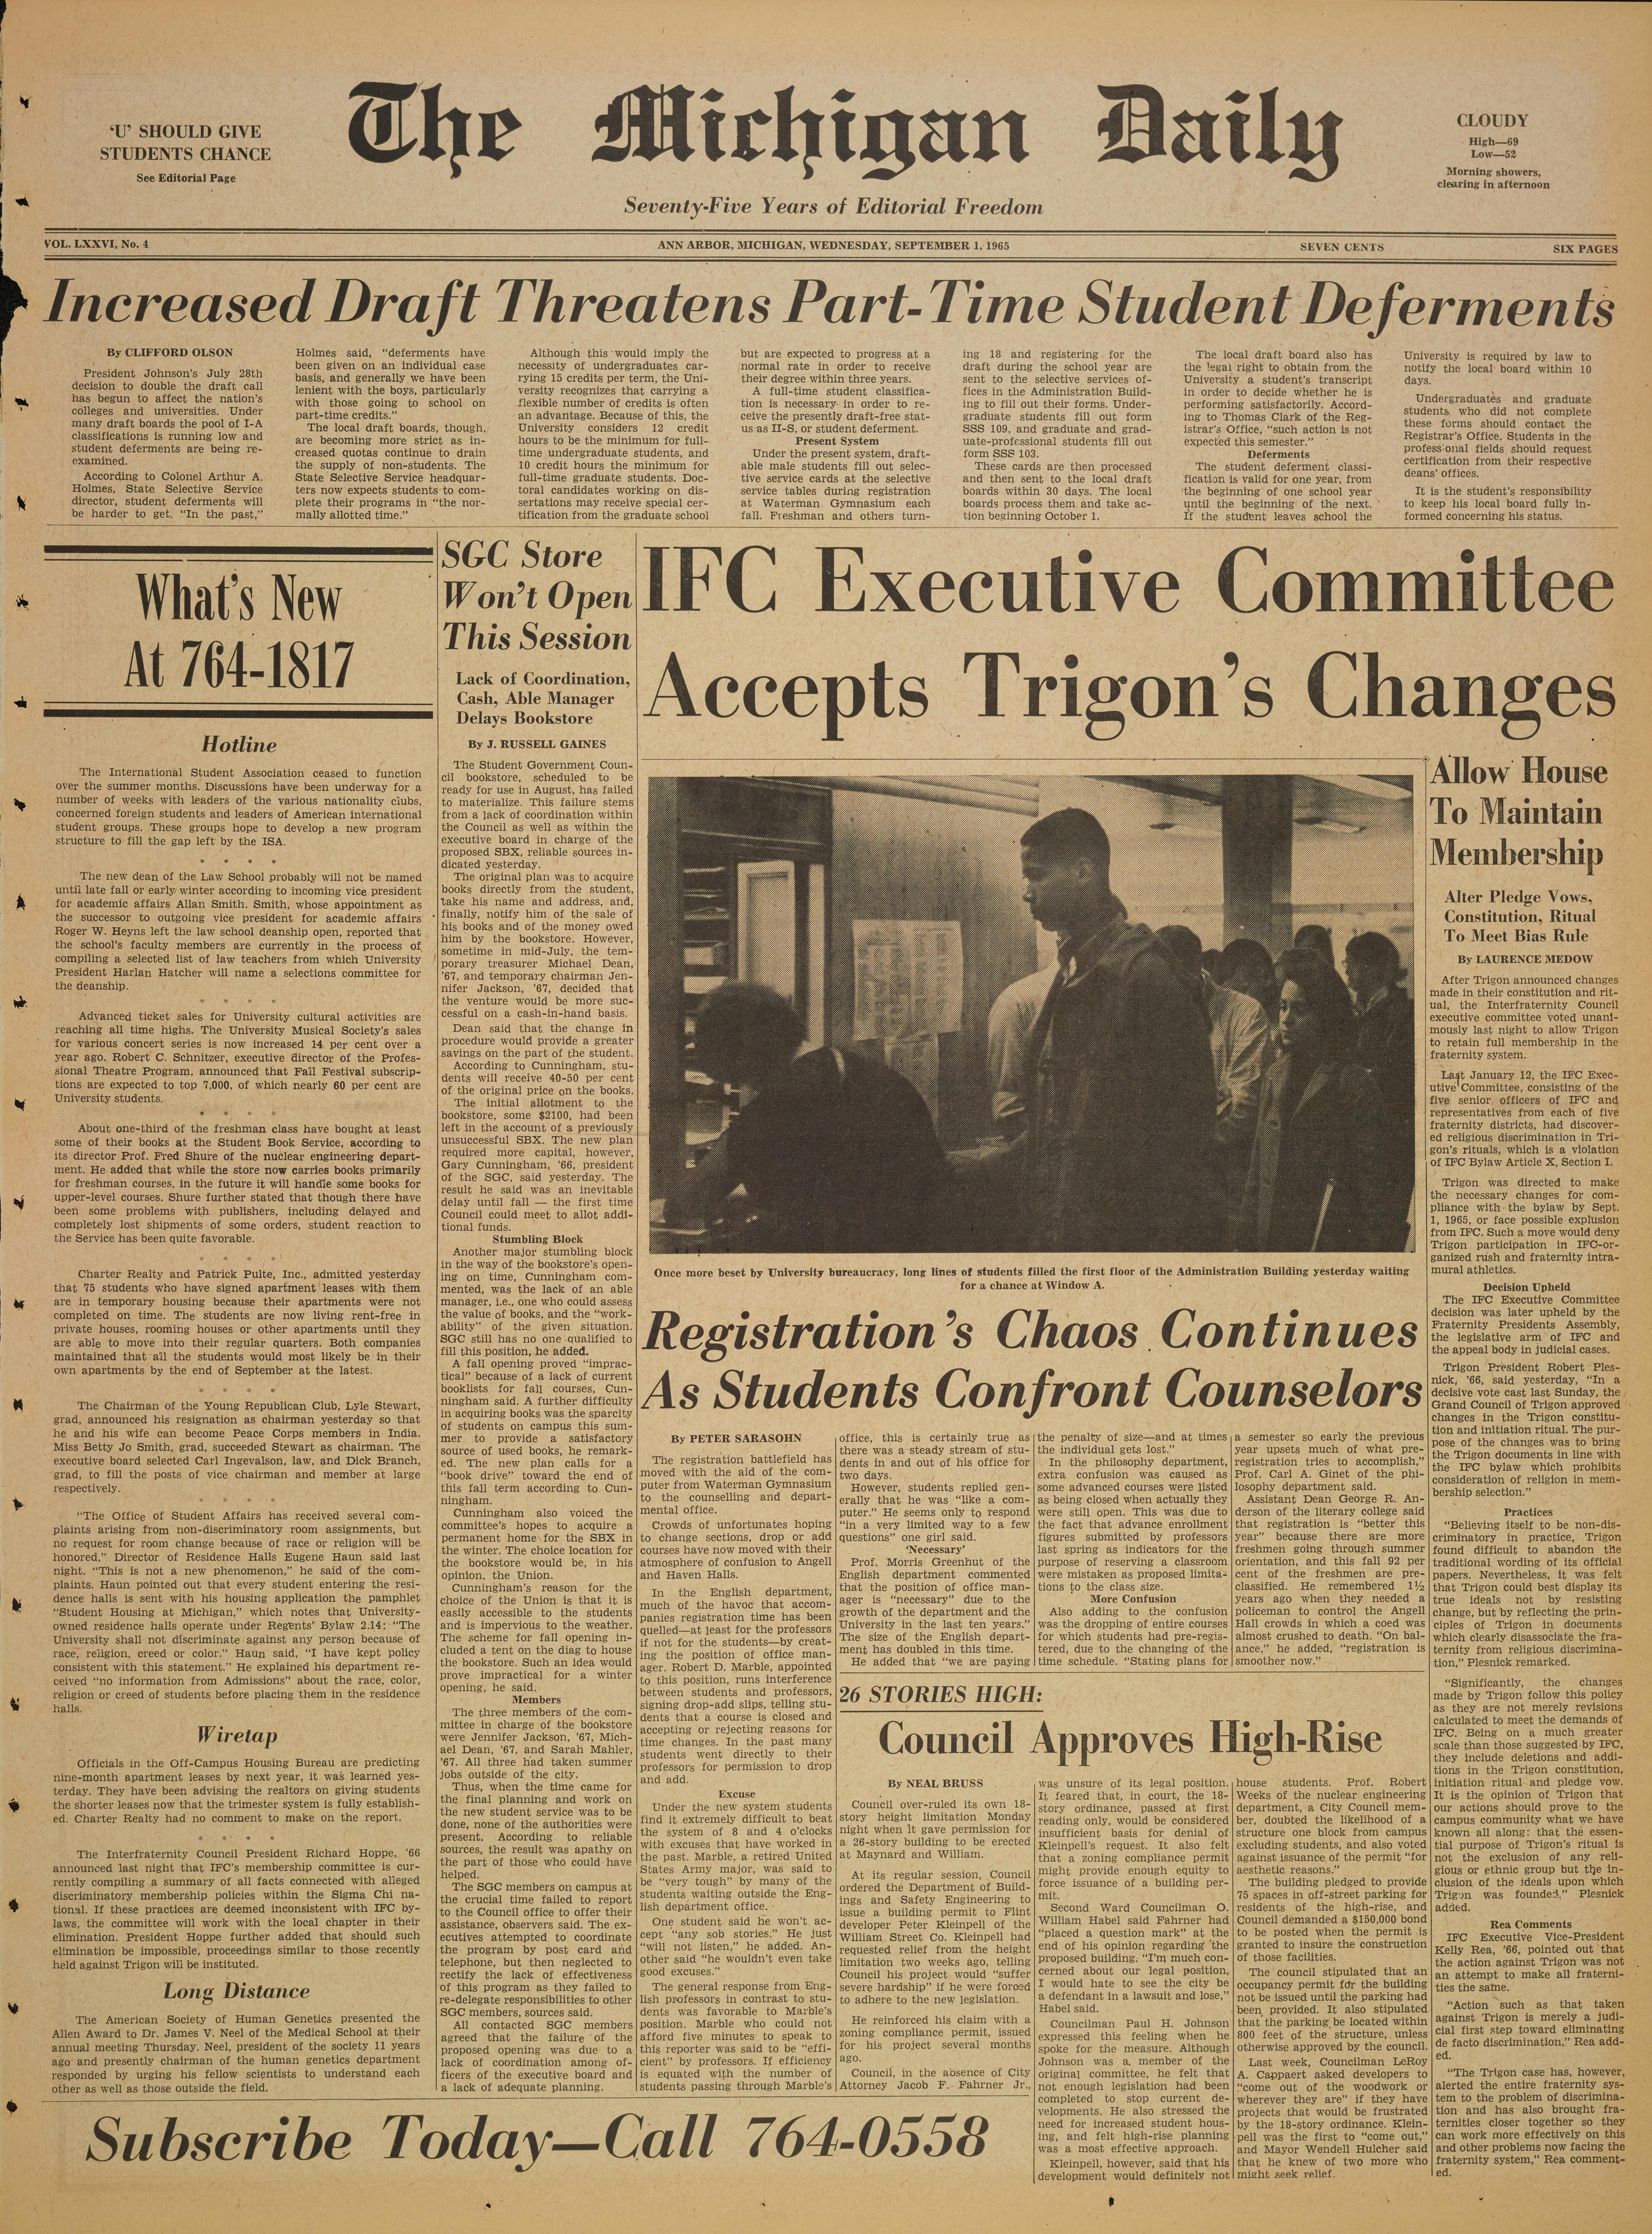 Michigan Daily Digital Archives - September 01, 1965 (vol